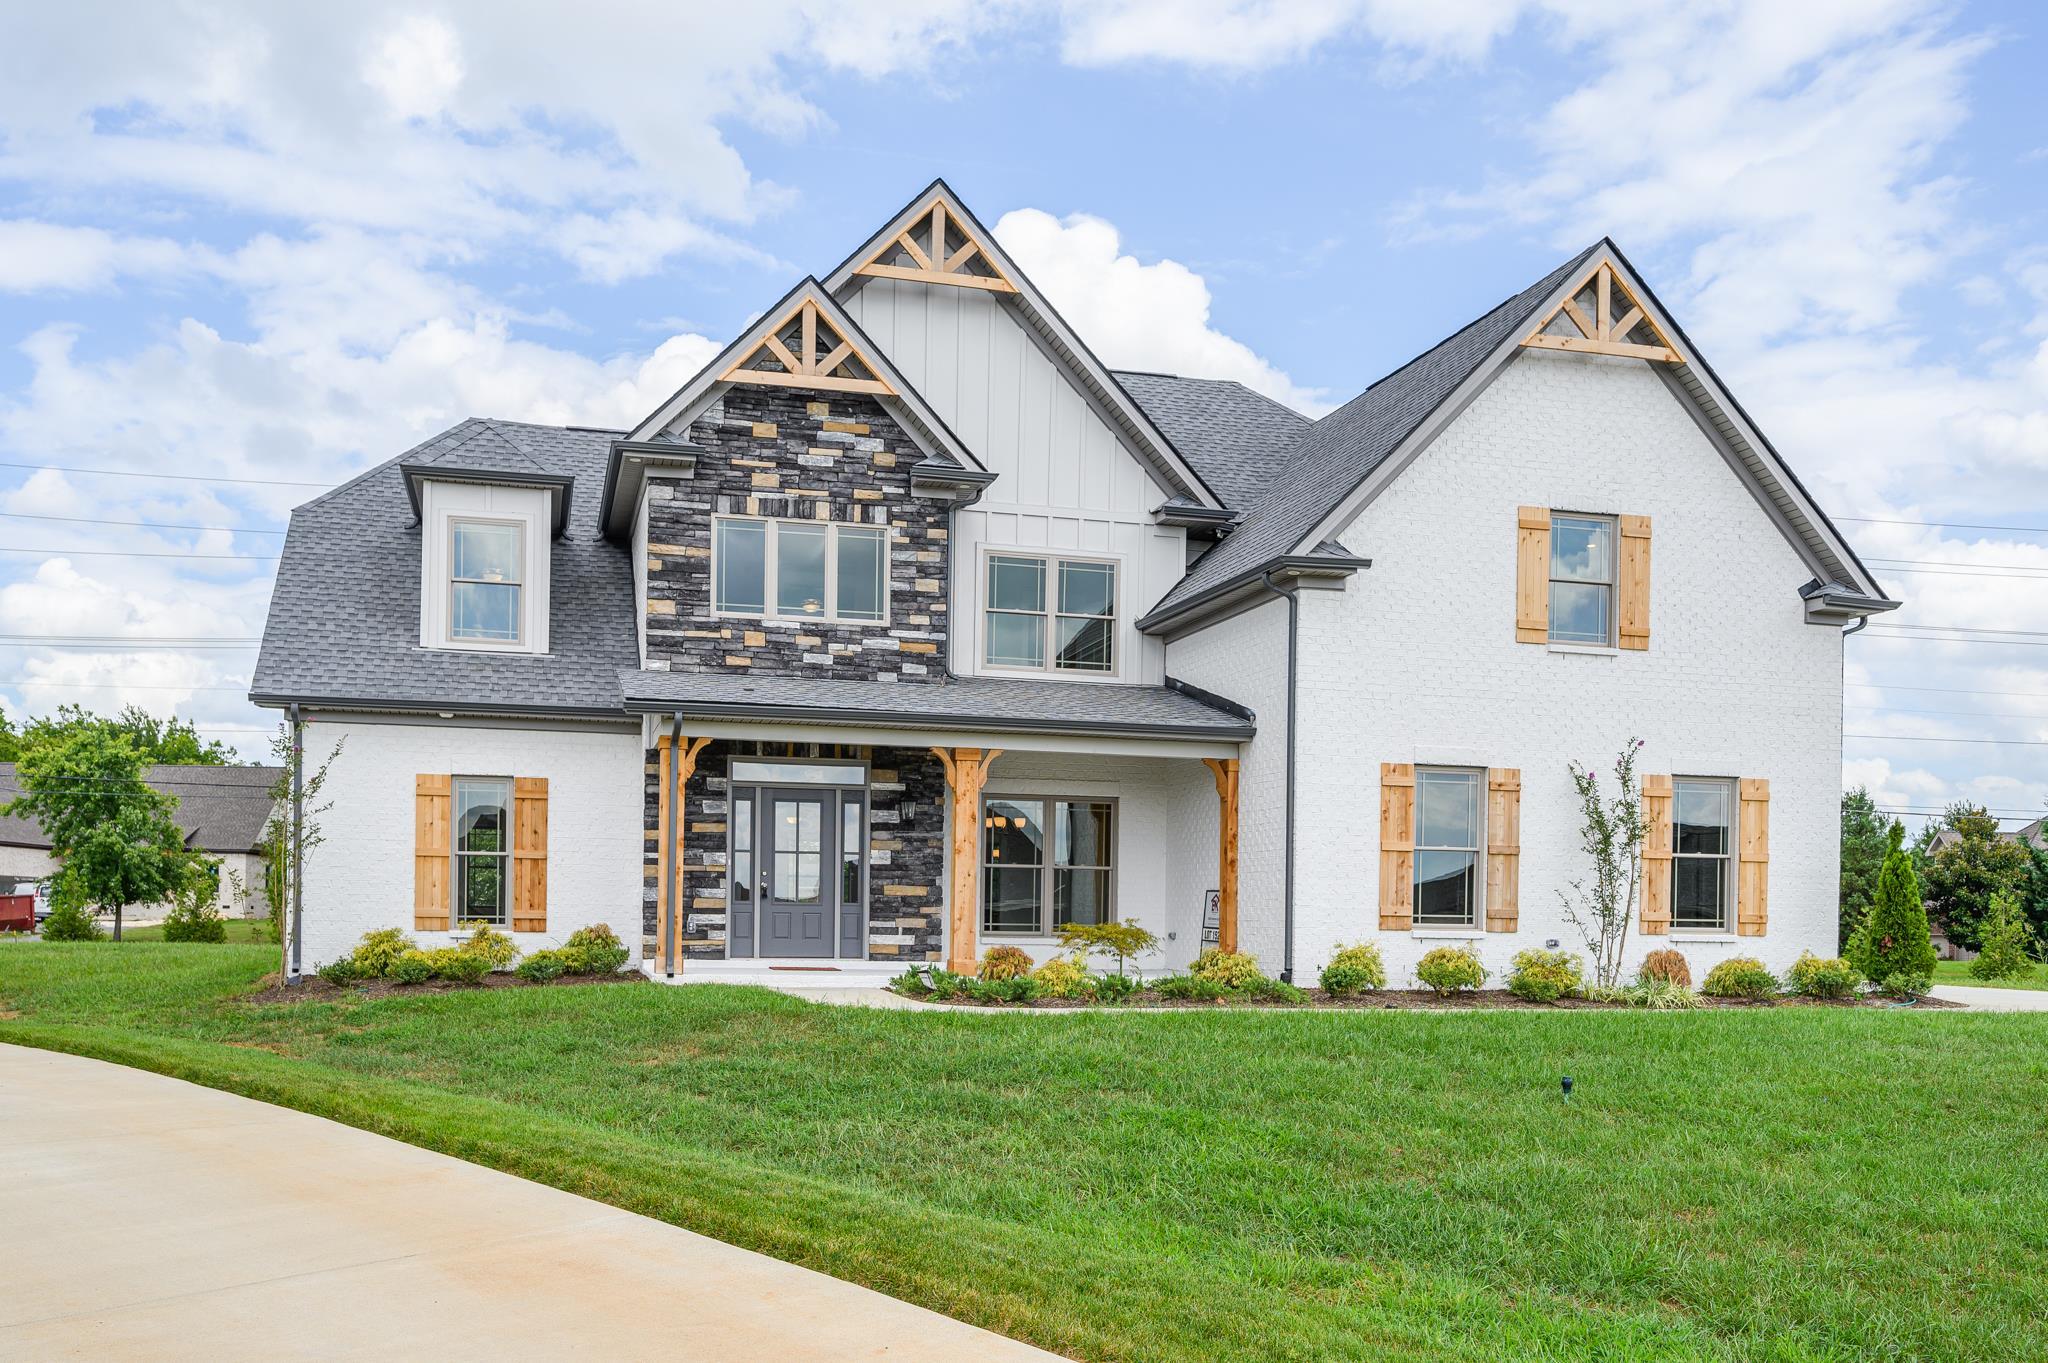 2830 Bertram Ct, Murfreesboro, TN 37129 - Murfreesboro, TN real estate listing